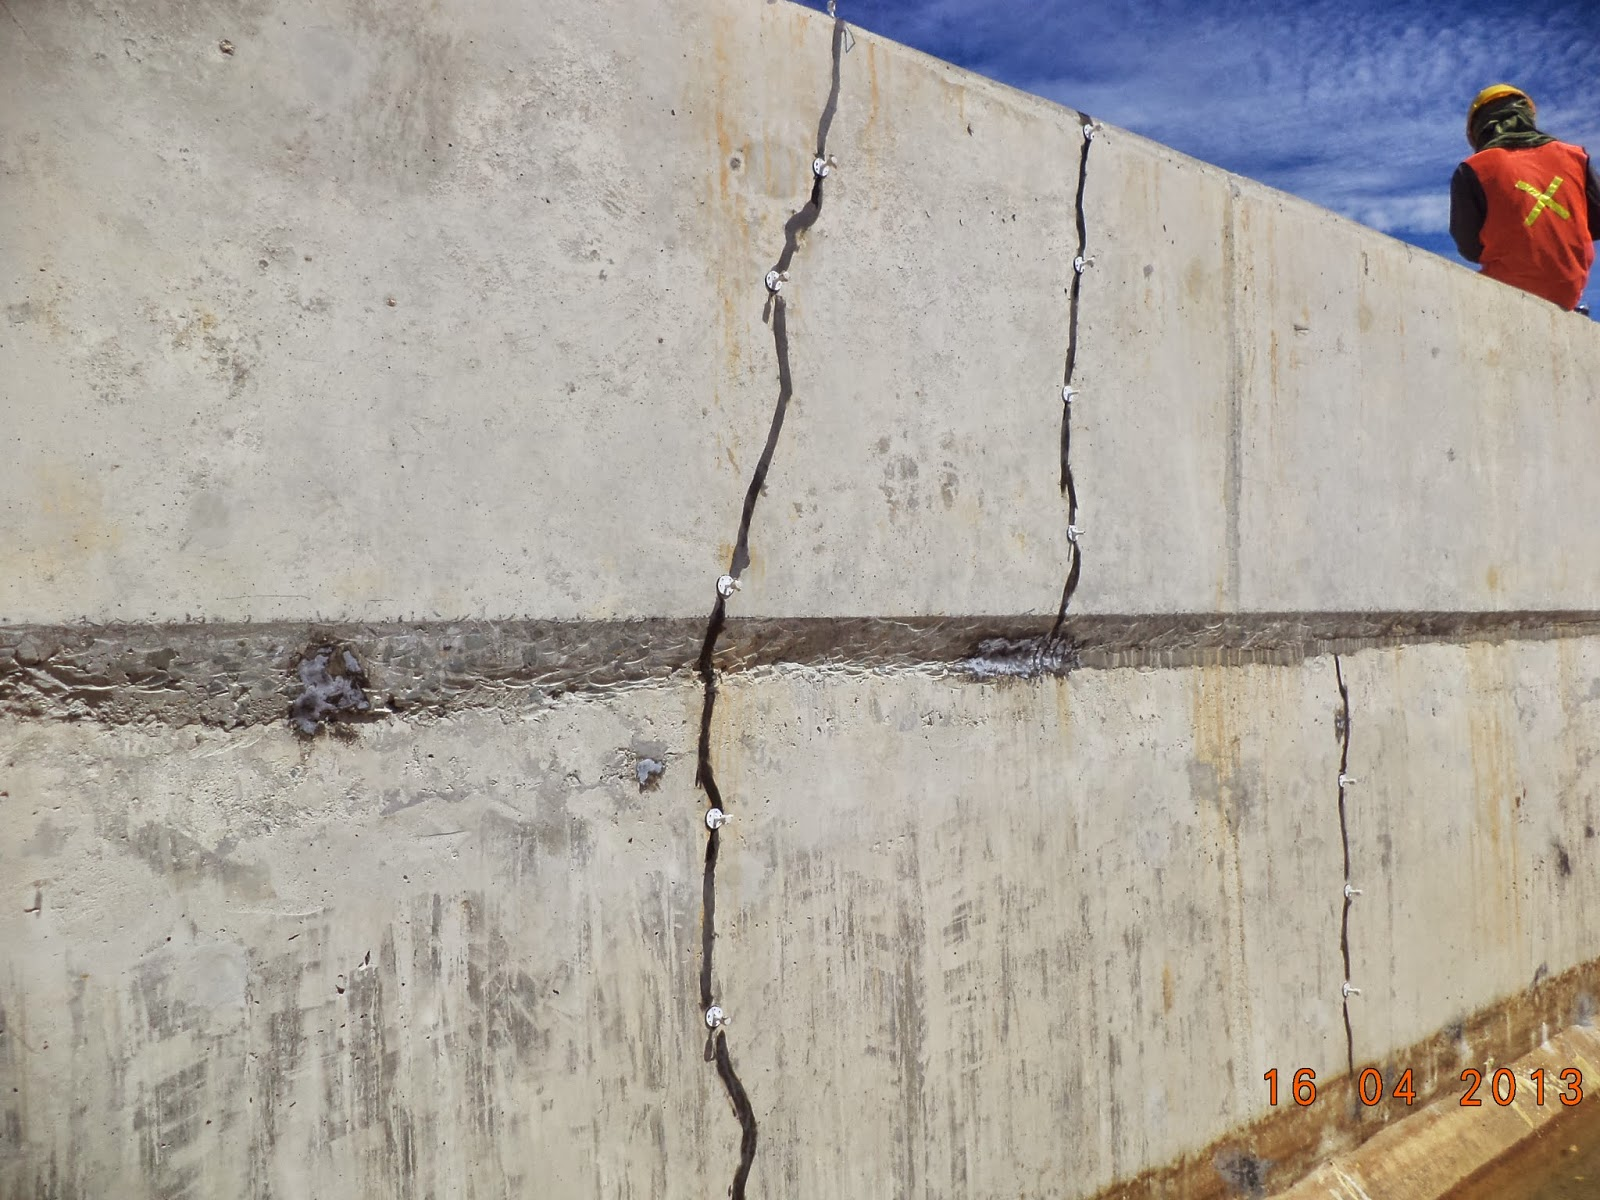 perbaikan beton retak pada dinding